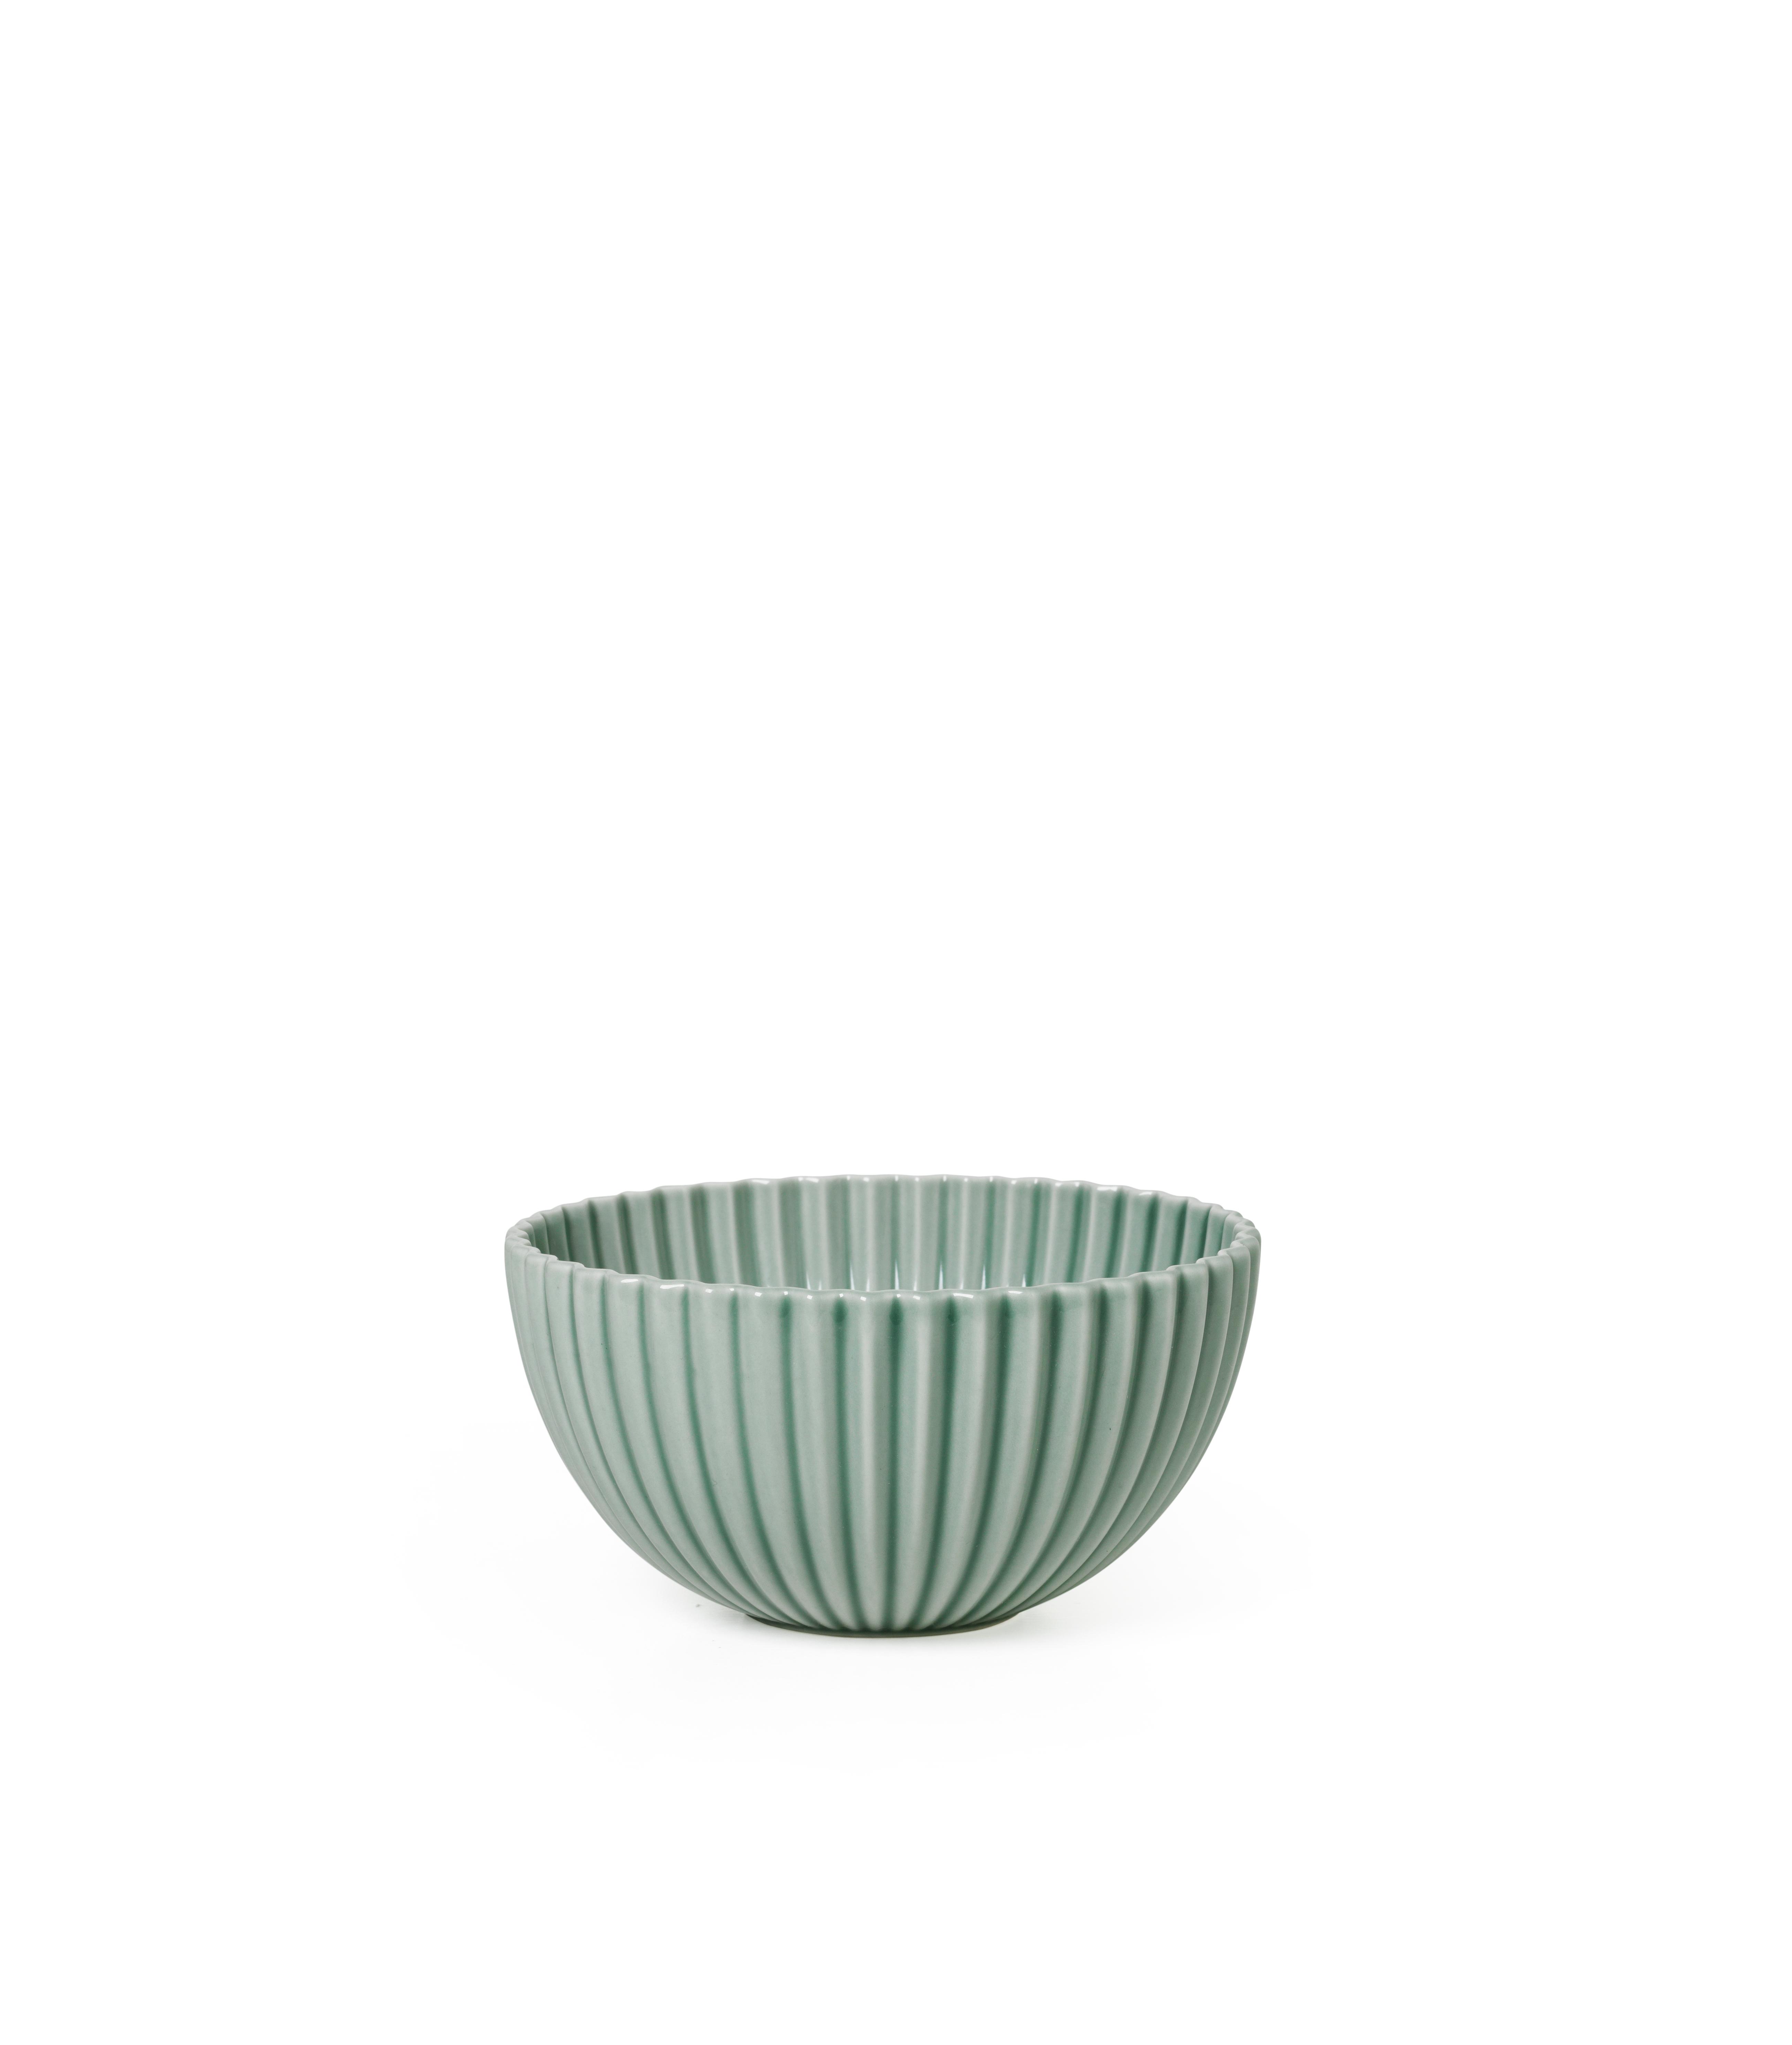 Dottir - Samsurium Snack Bowl